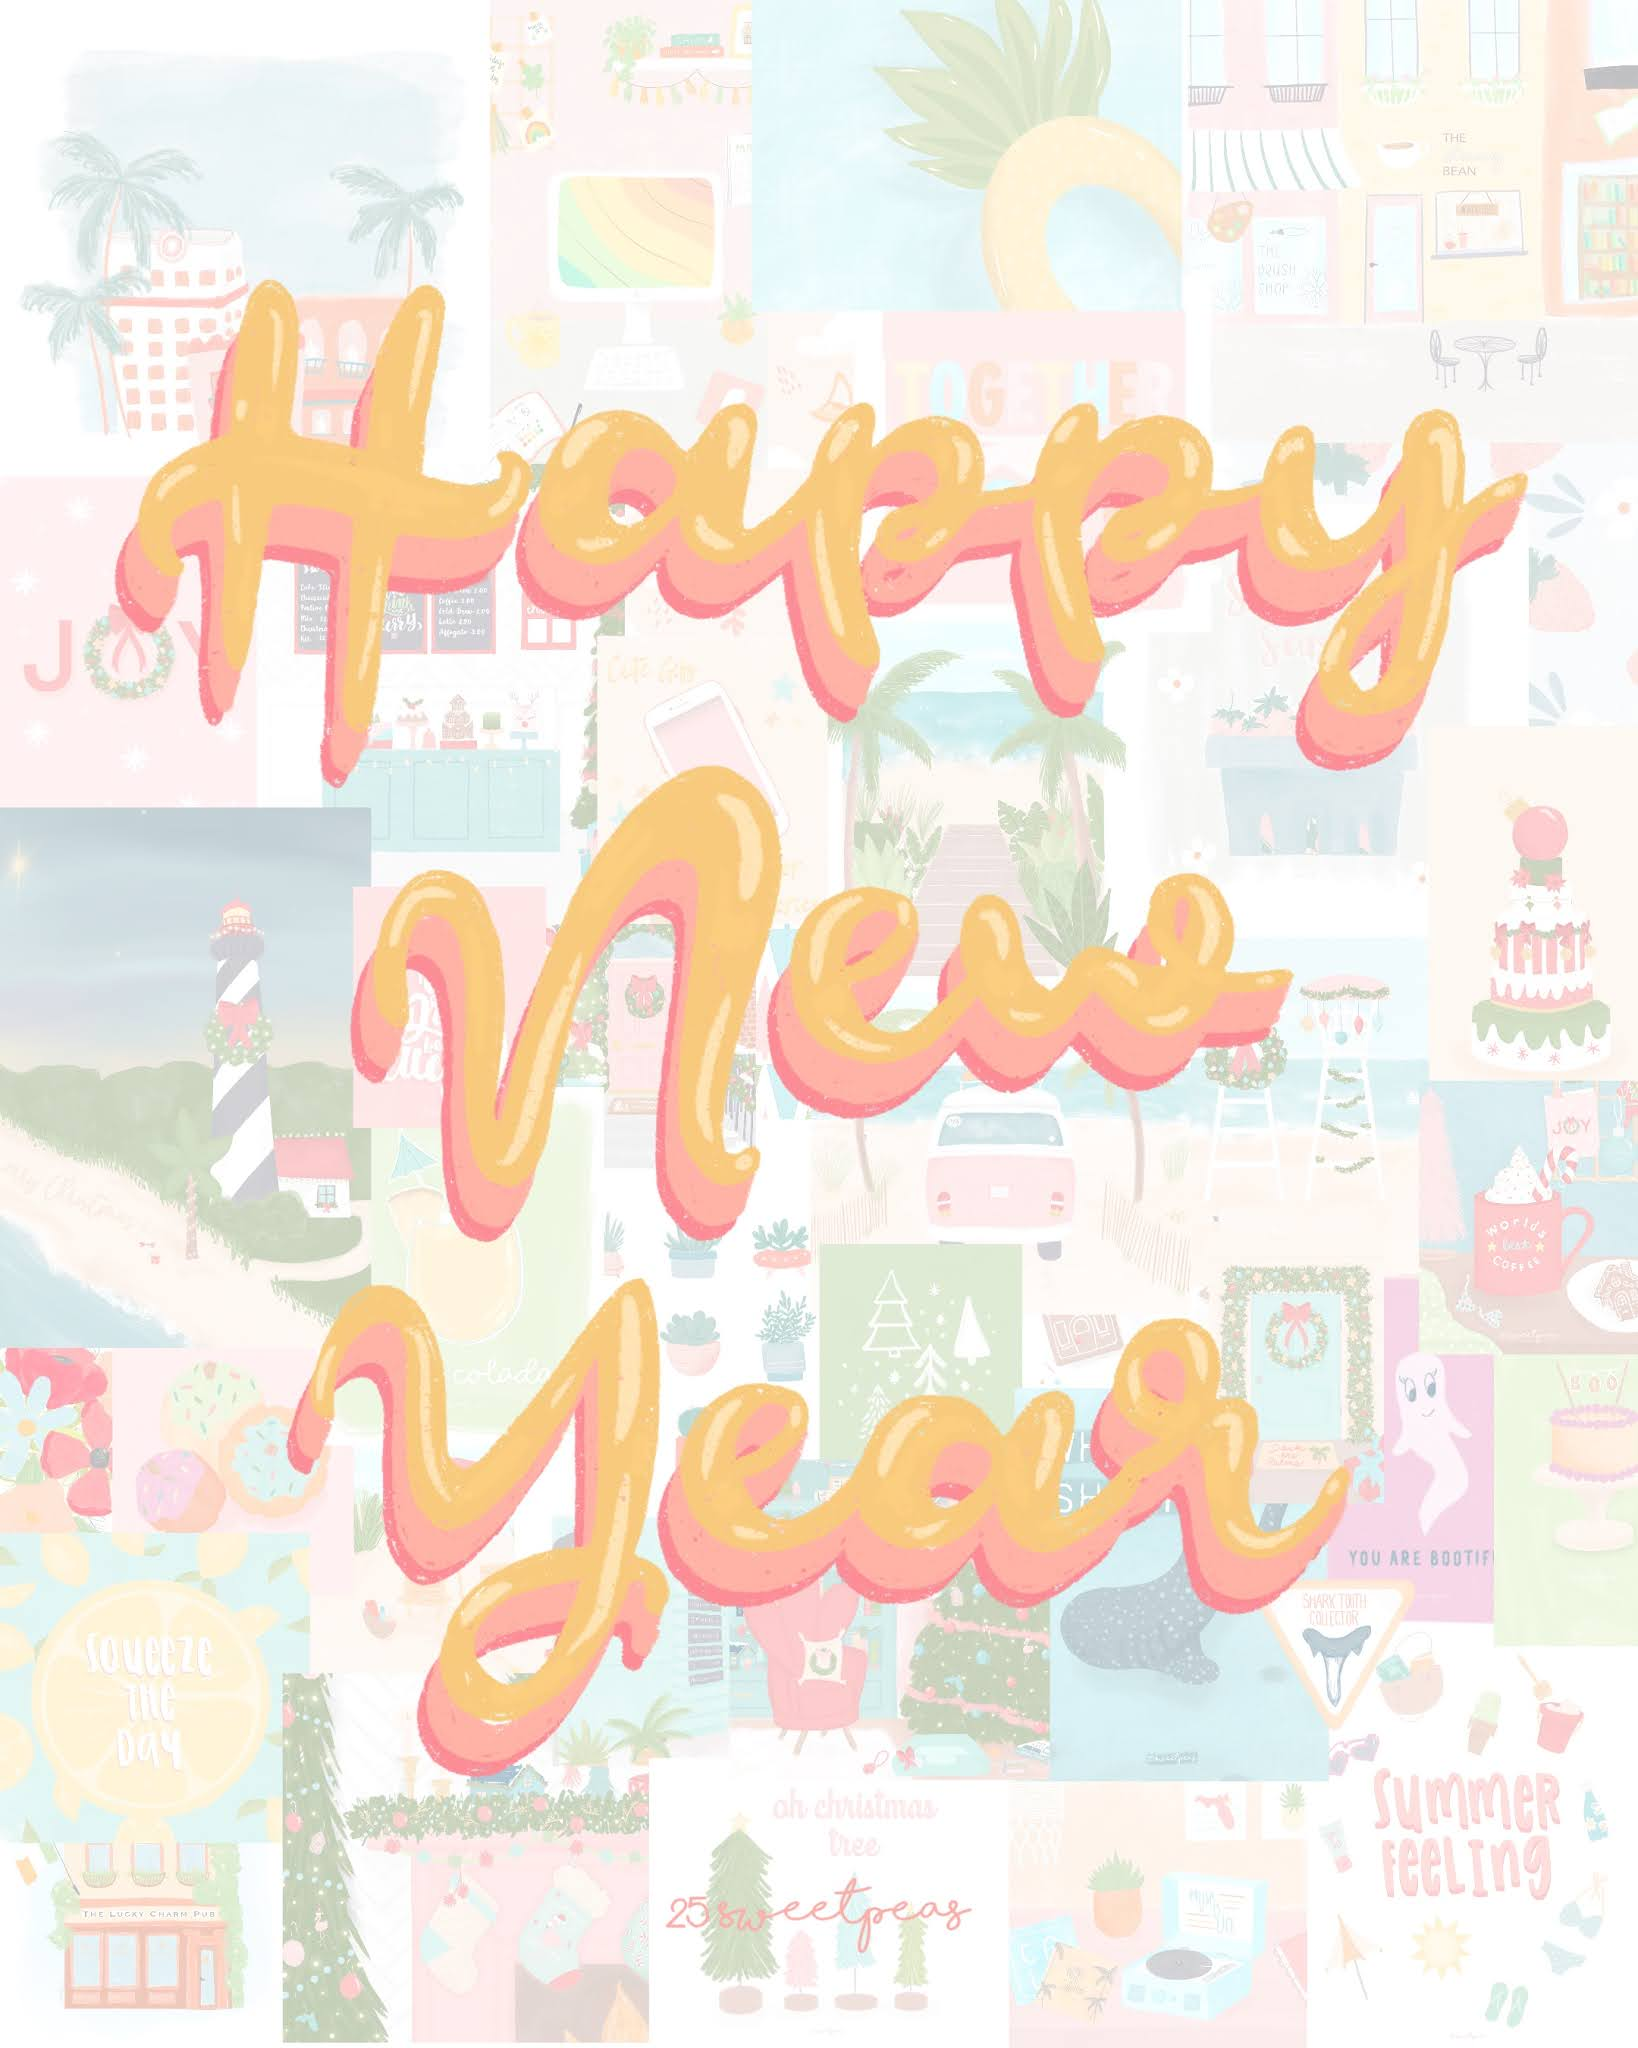 25 Sweetpeas 2021 Happy new Year